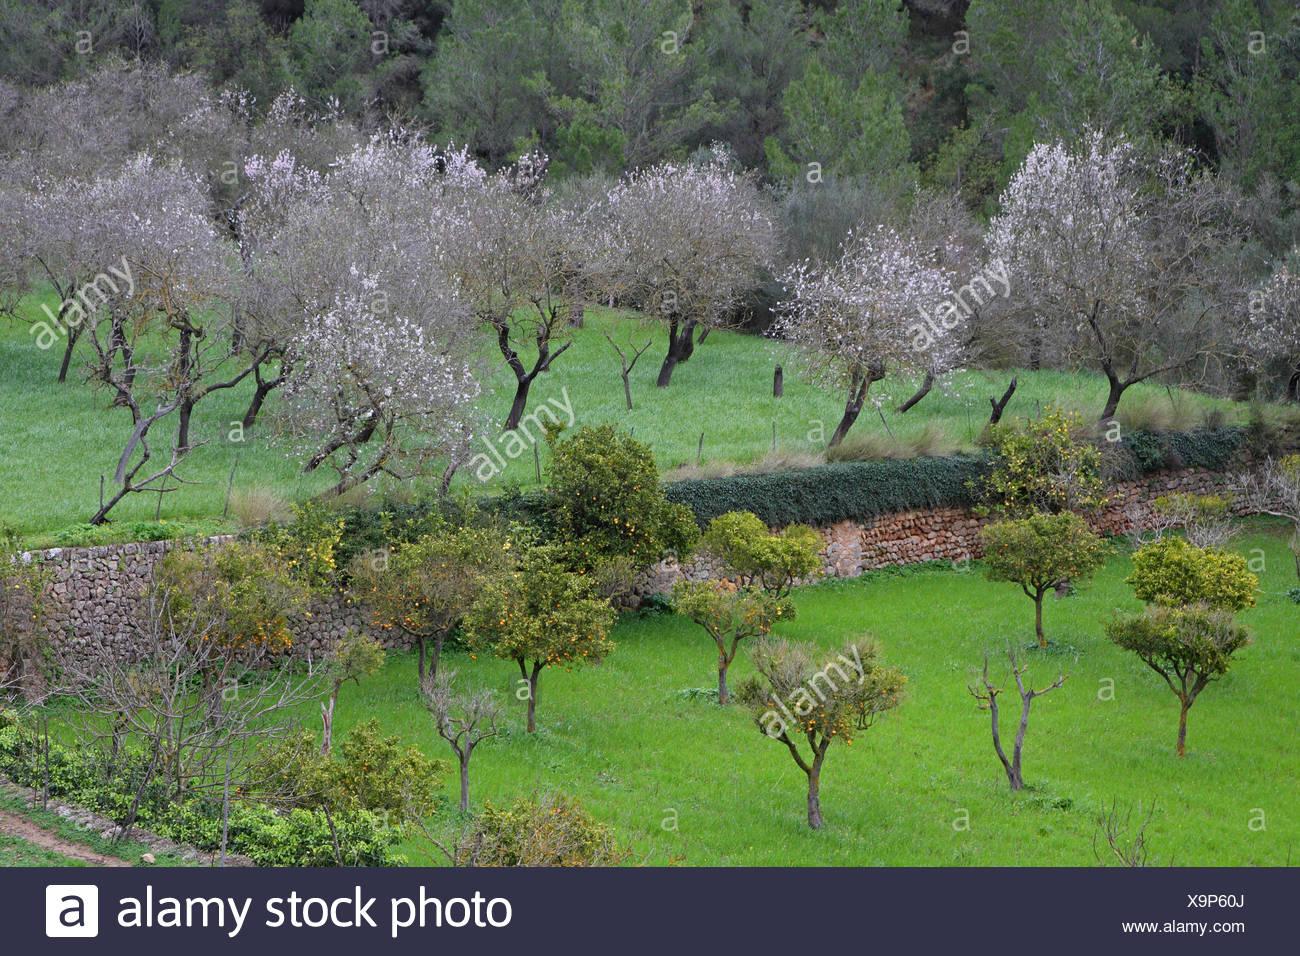 almond trees and orange trees in a fruit tree, Spain, Balearen, Majorca - Stock Image